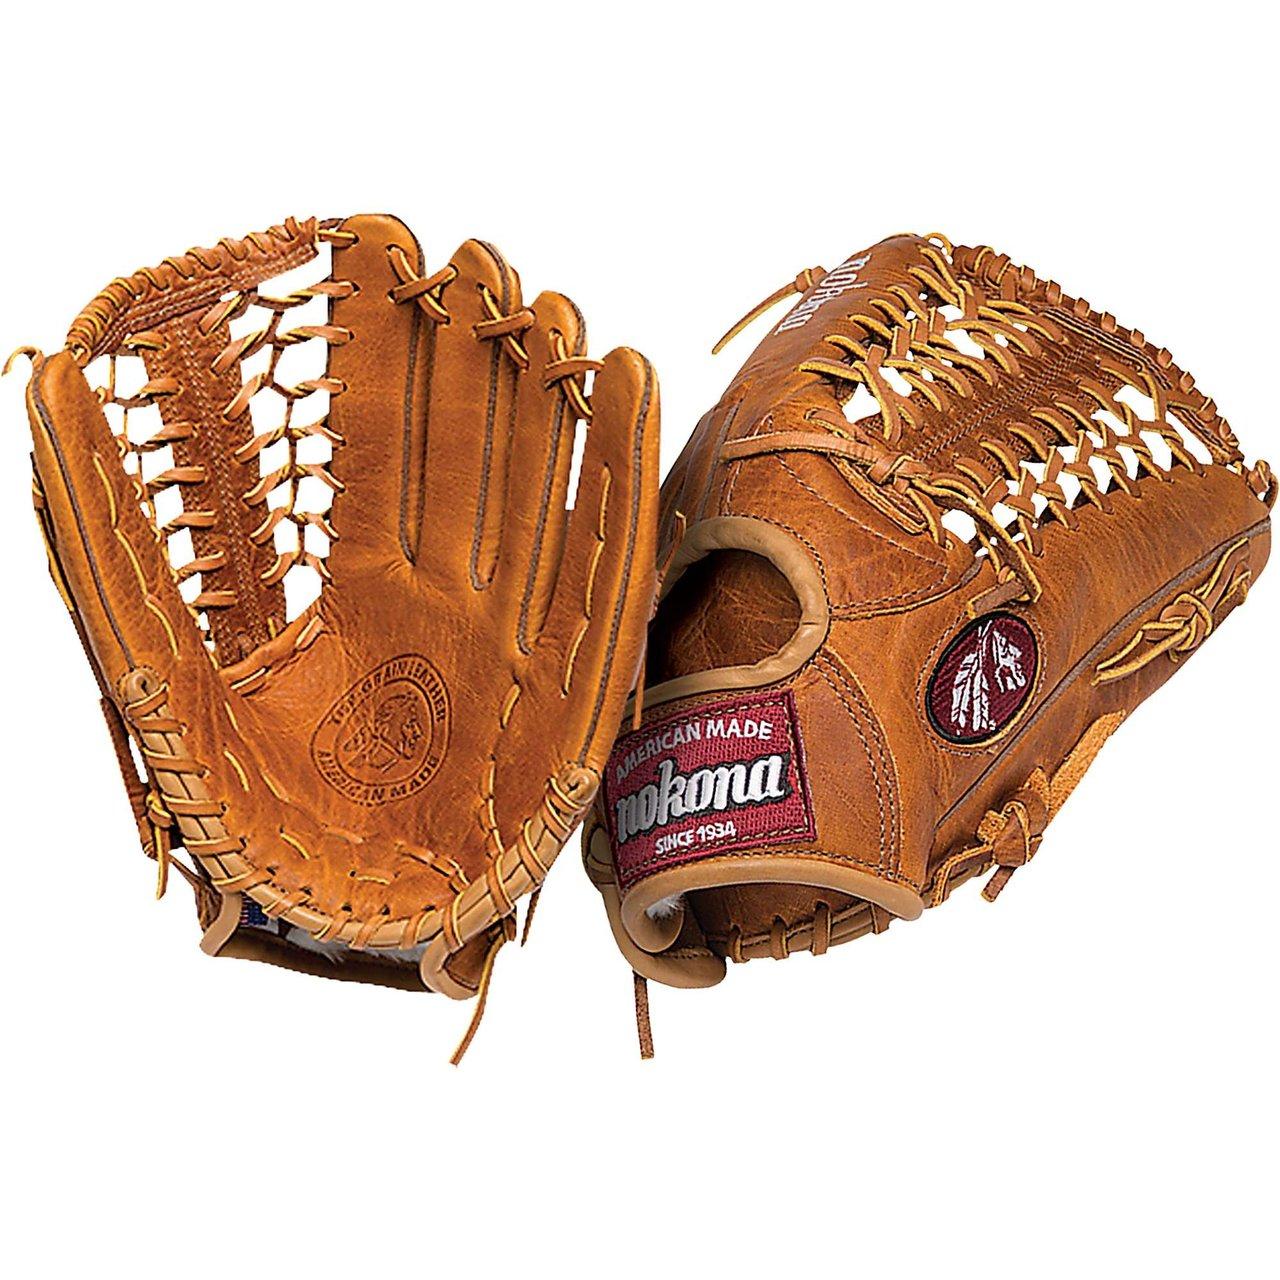 nokona-generation-g-1275m-baseball-glove-12-75-inch-right-hand-throw G-1275M-Right Hand Throw Nokona 808808889465 Nokona Generaton Series 12.75 inch Outfield Baseball Glove. Modified Trap Web.